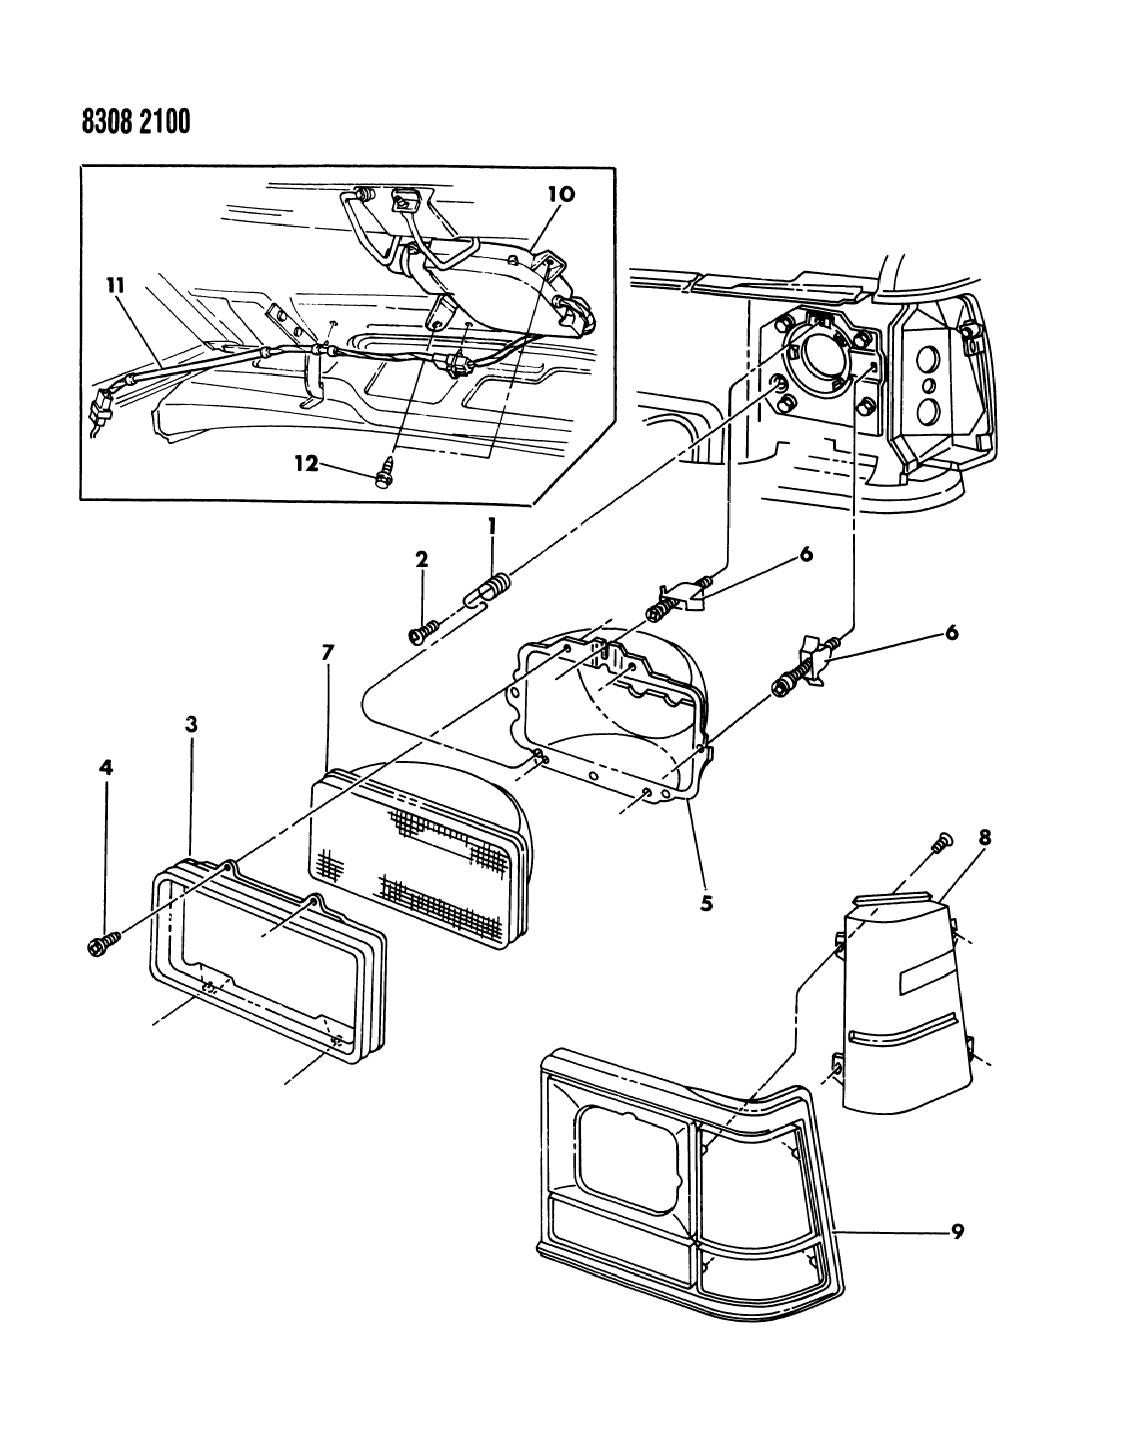 [NRIO_4796]   1989 Dodge Ram Van Lamps & Wiring (Front End) - Mopar Parts Giant | 1989 Dodge Ram Van Wiring |  | Mopar Parts Giant